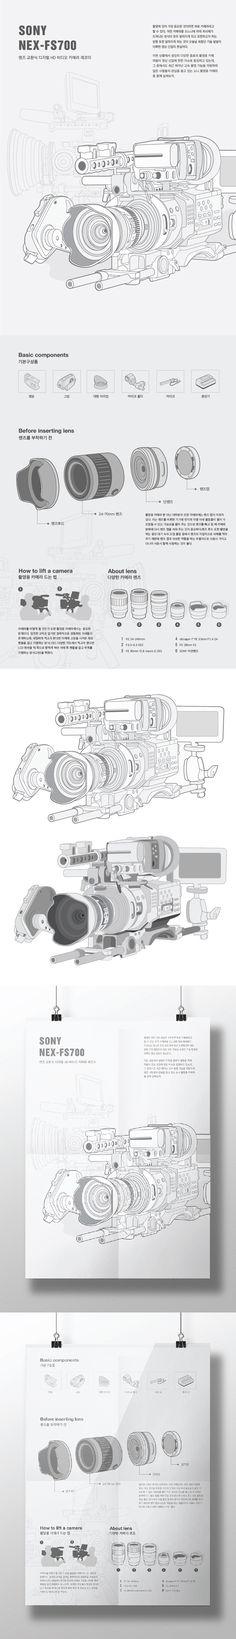 Lee Kyeong Ryeon | SONY NEX-FS700 | Information Design 2016│ Major in Digital Media Design │#hicoda │hicoda.hongik.ac.kr